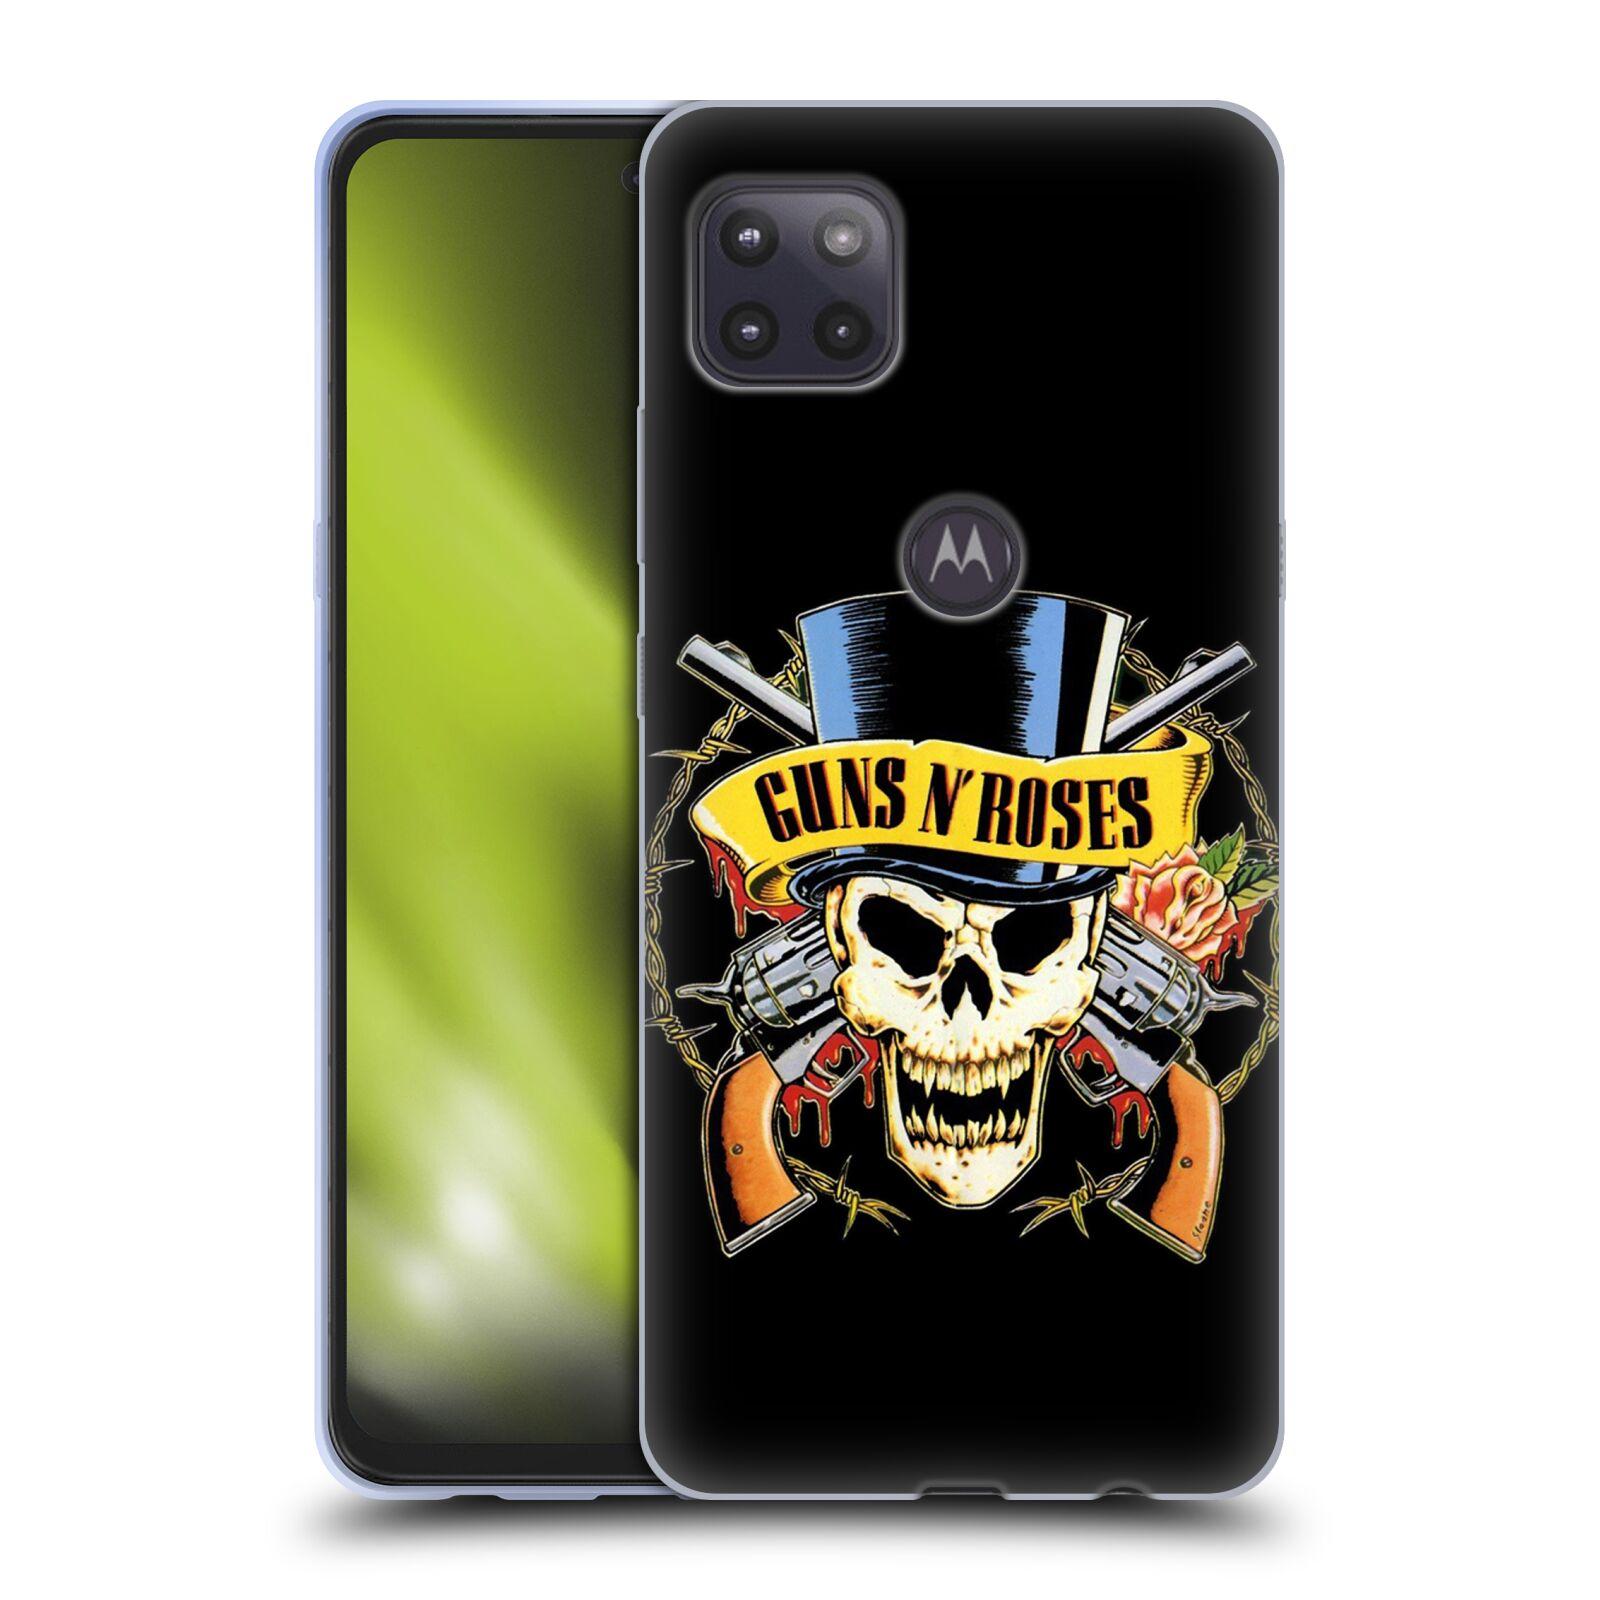 Silikonové pouzdro na mobil Motorola Moto G 5G - Head Case - Guns N' Roses - Lebka